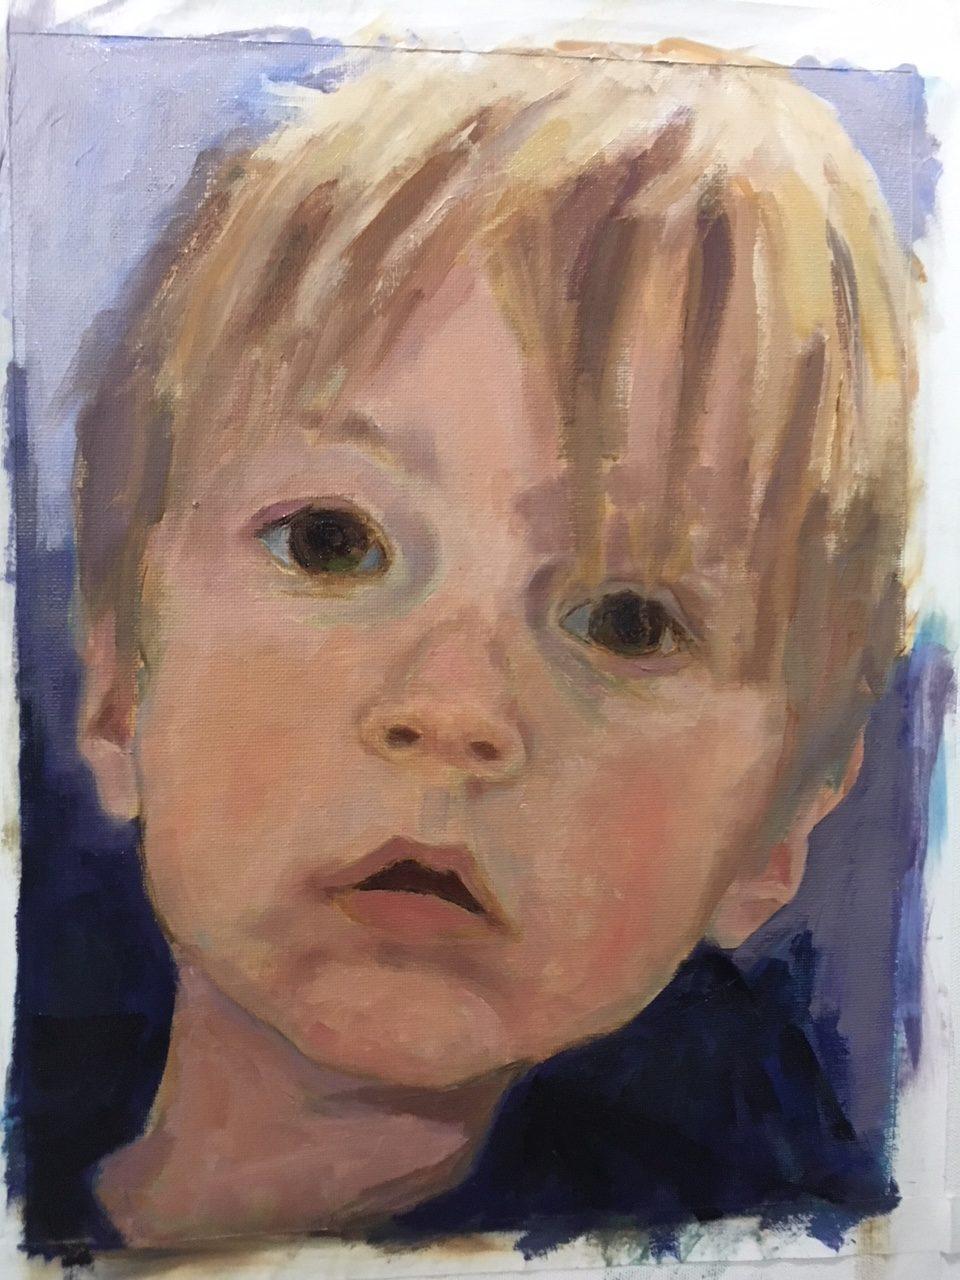 Isaiah (oil on canvas) by artist Kathleen Gefell, New York